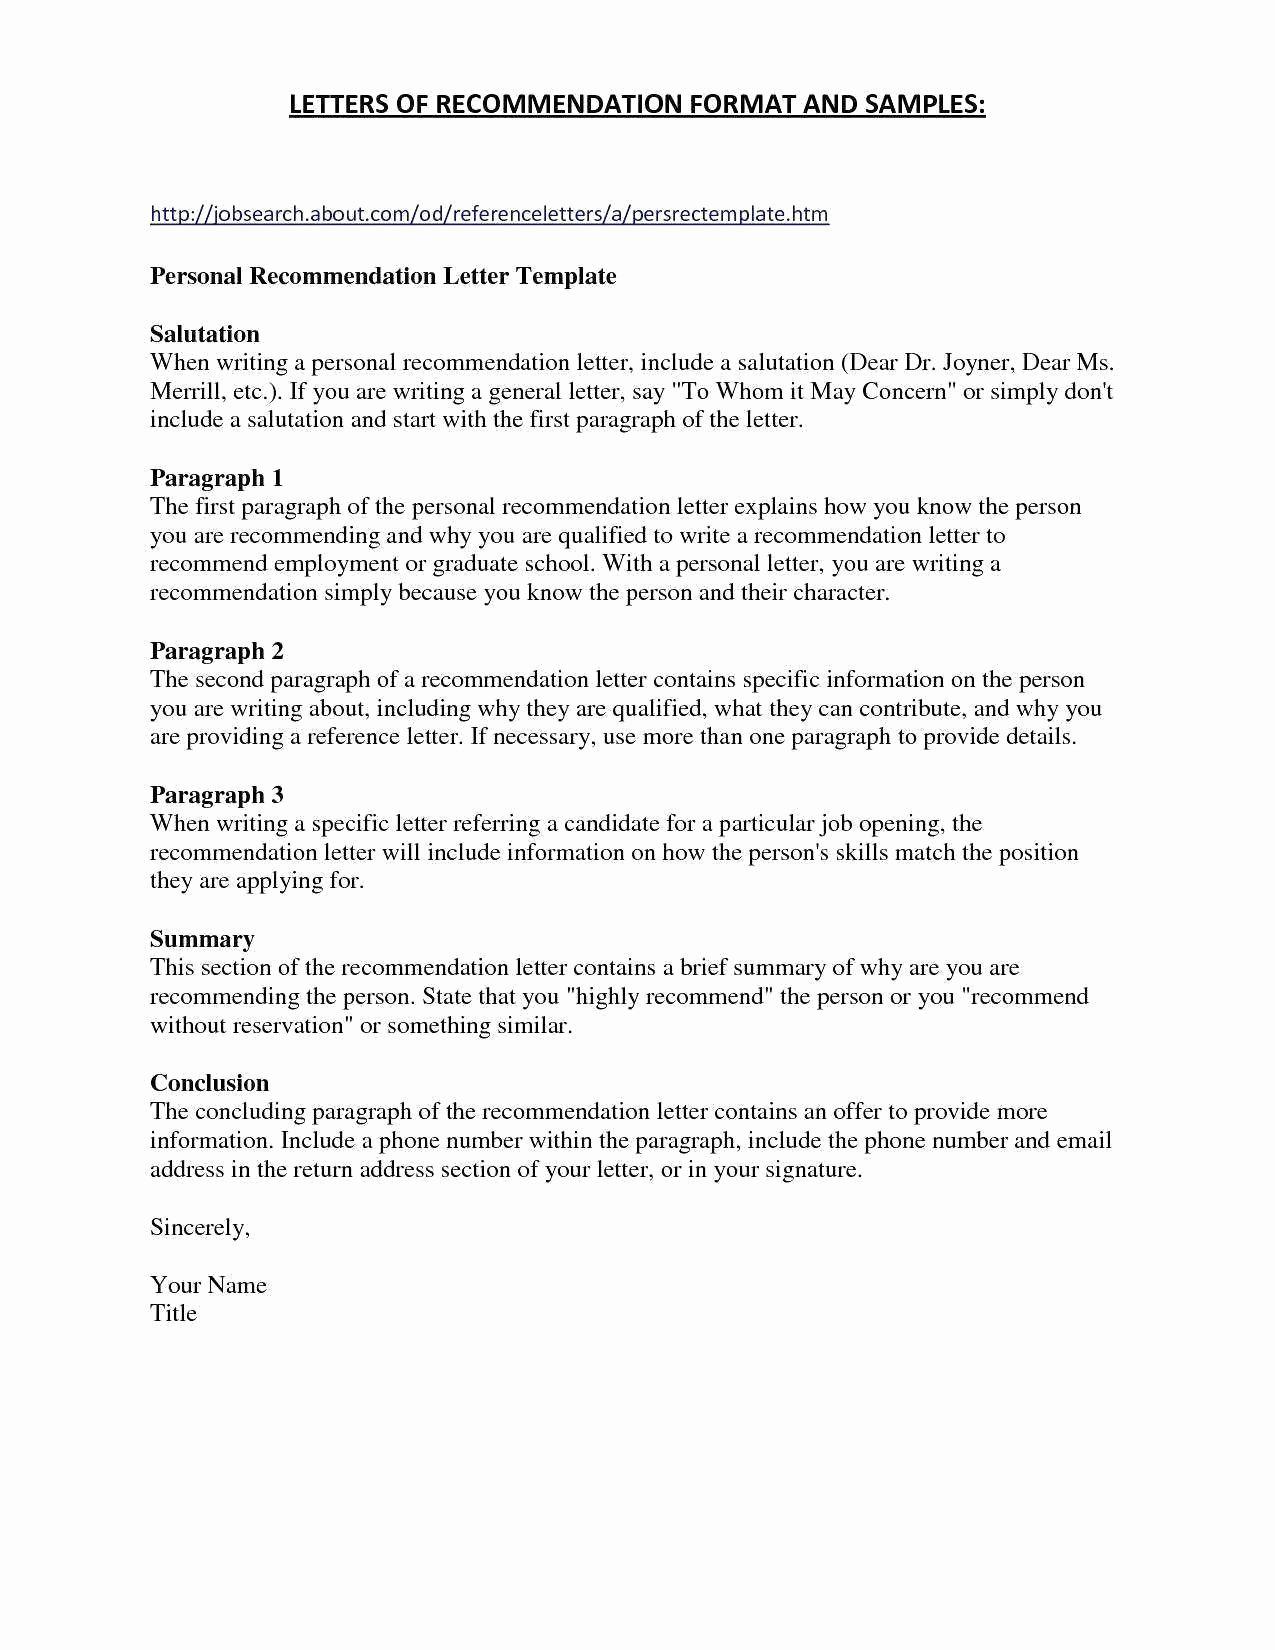 Minister ordination Certificate Template Best Of 17 Awesome Pastor ordination Certificate Templates